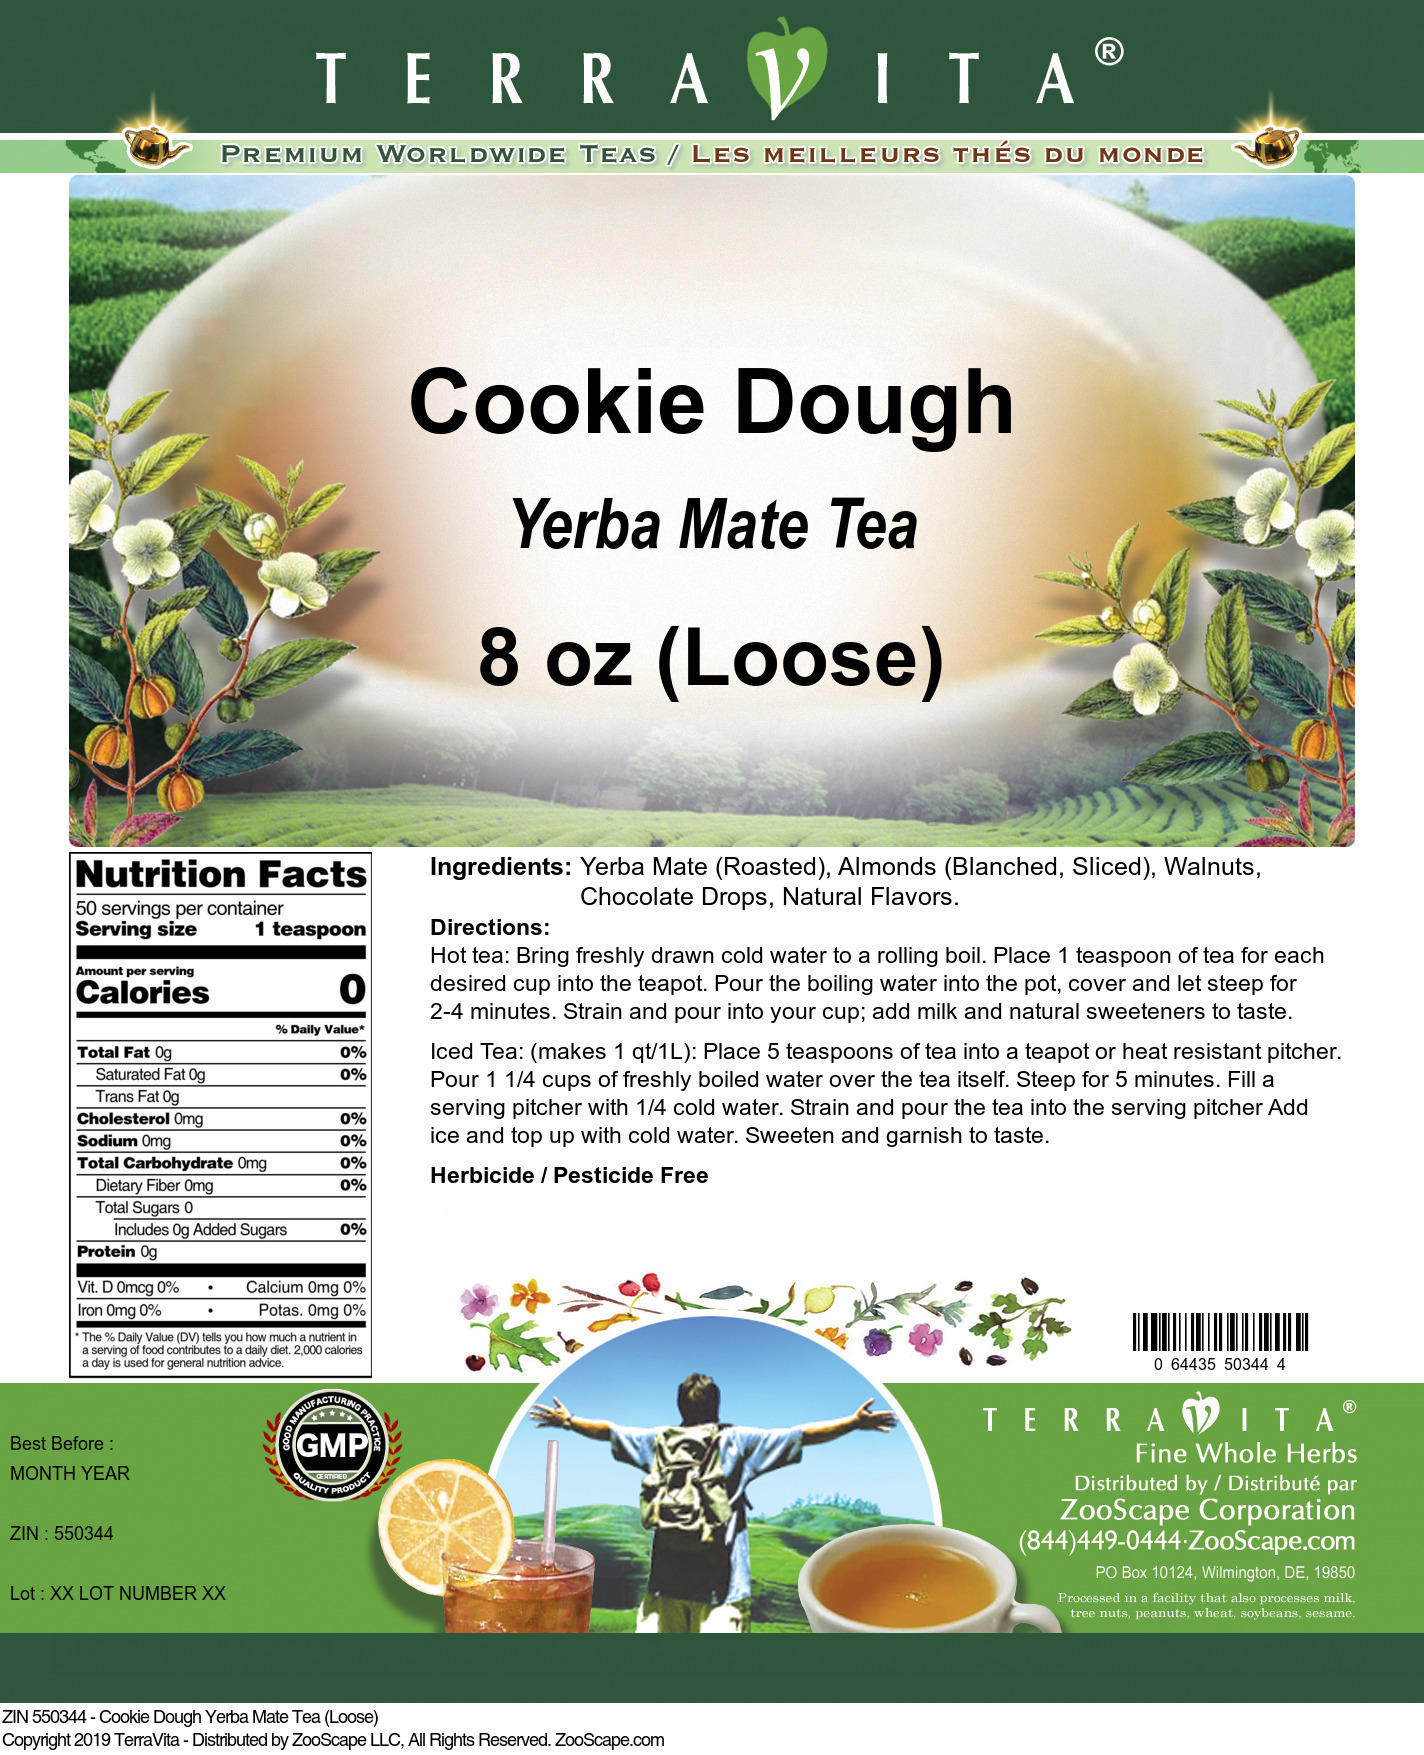 Cookie Dough Yerba Mate